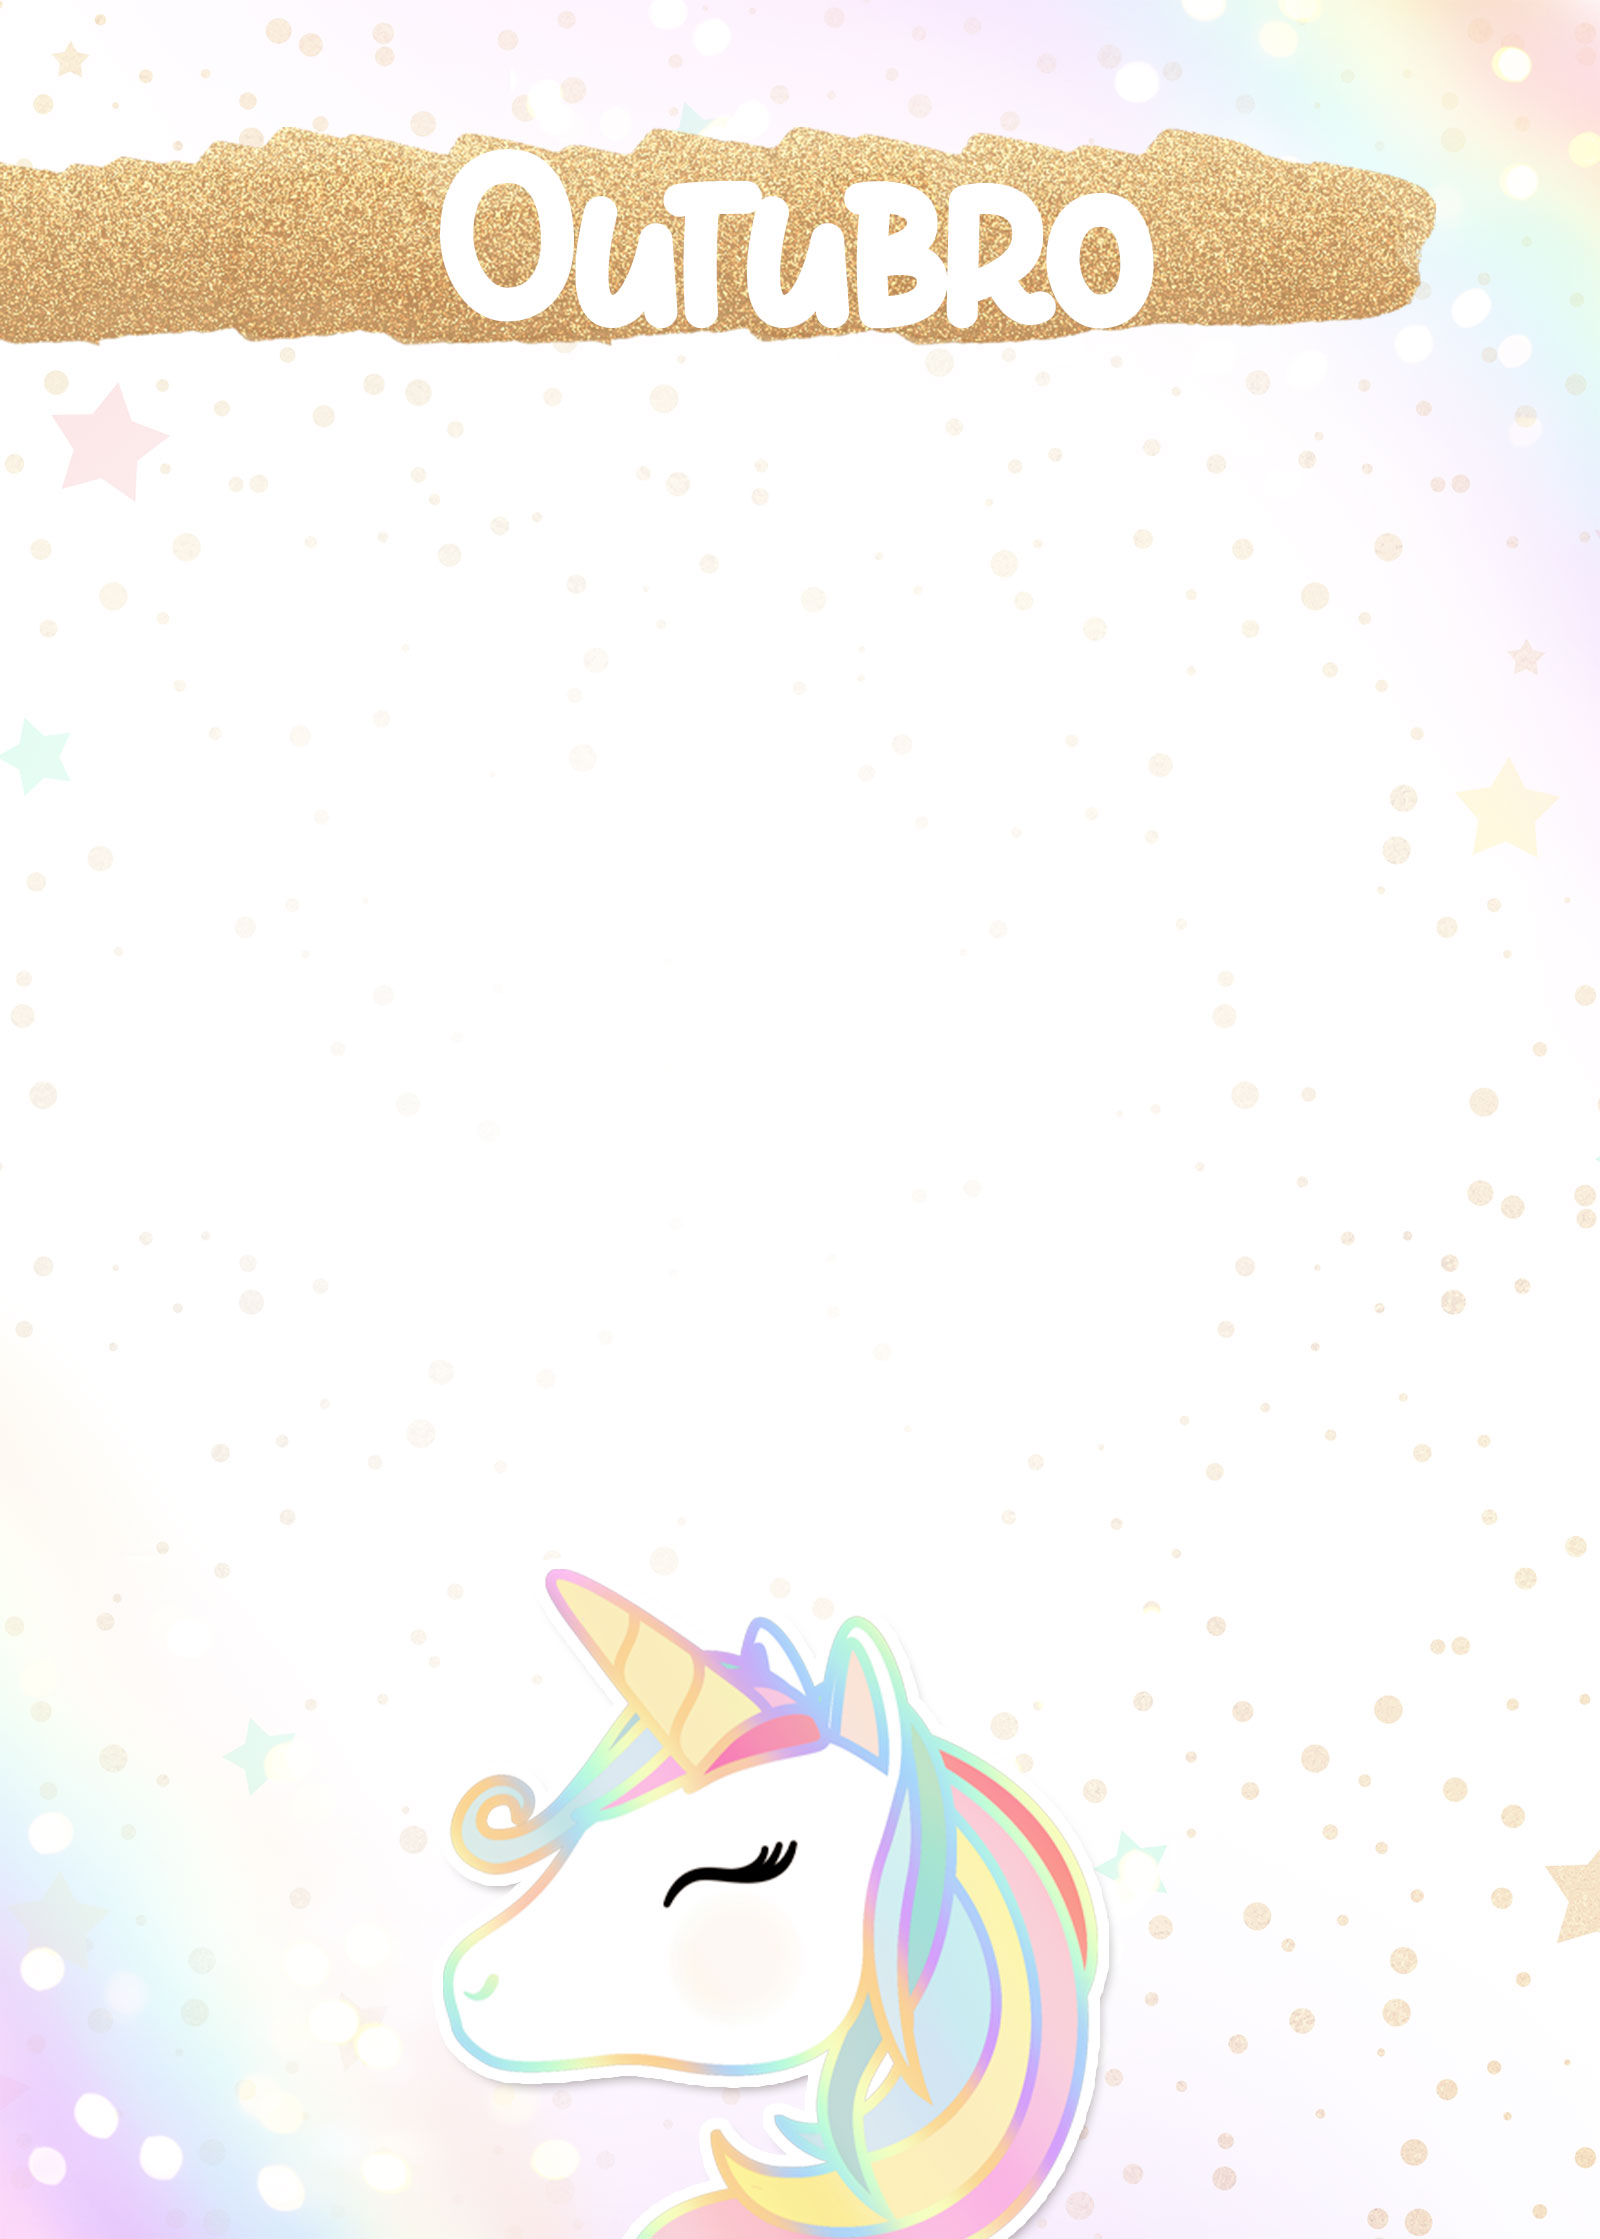 Planner Unicornio 2020 capa outubro